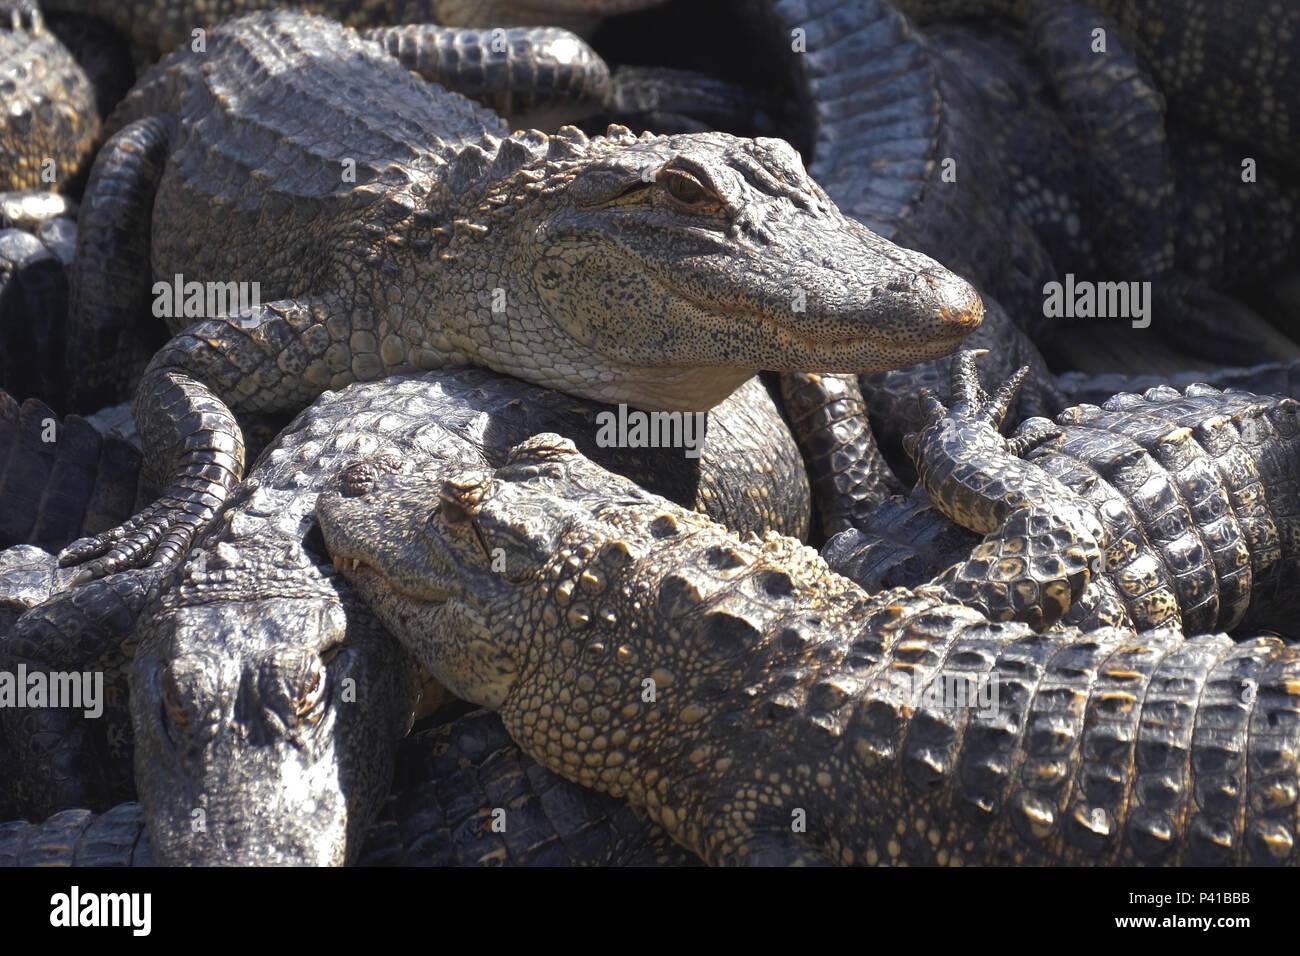 Alligators breeding farm. - Stock Image